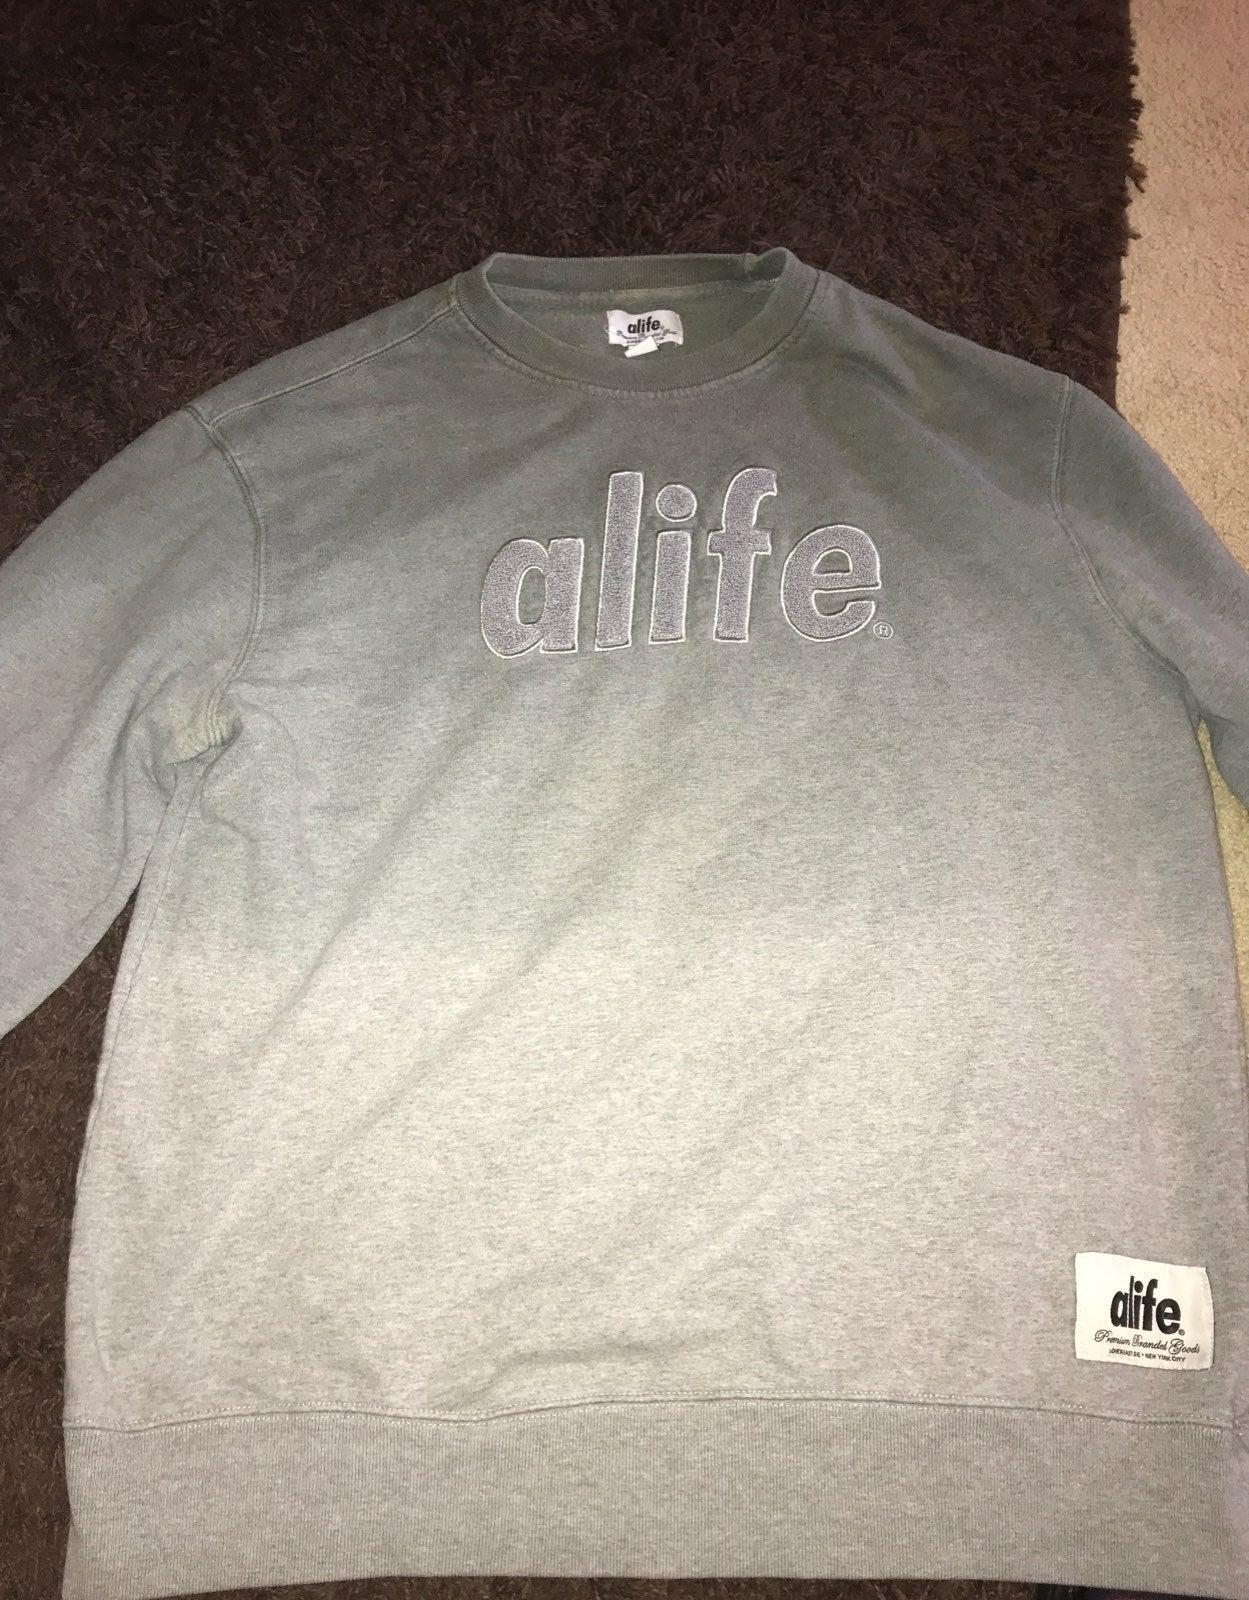 Alife mens Xl grey sweater